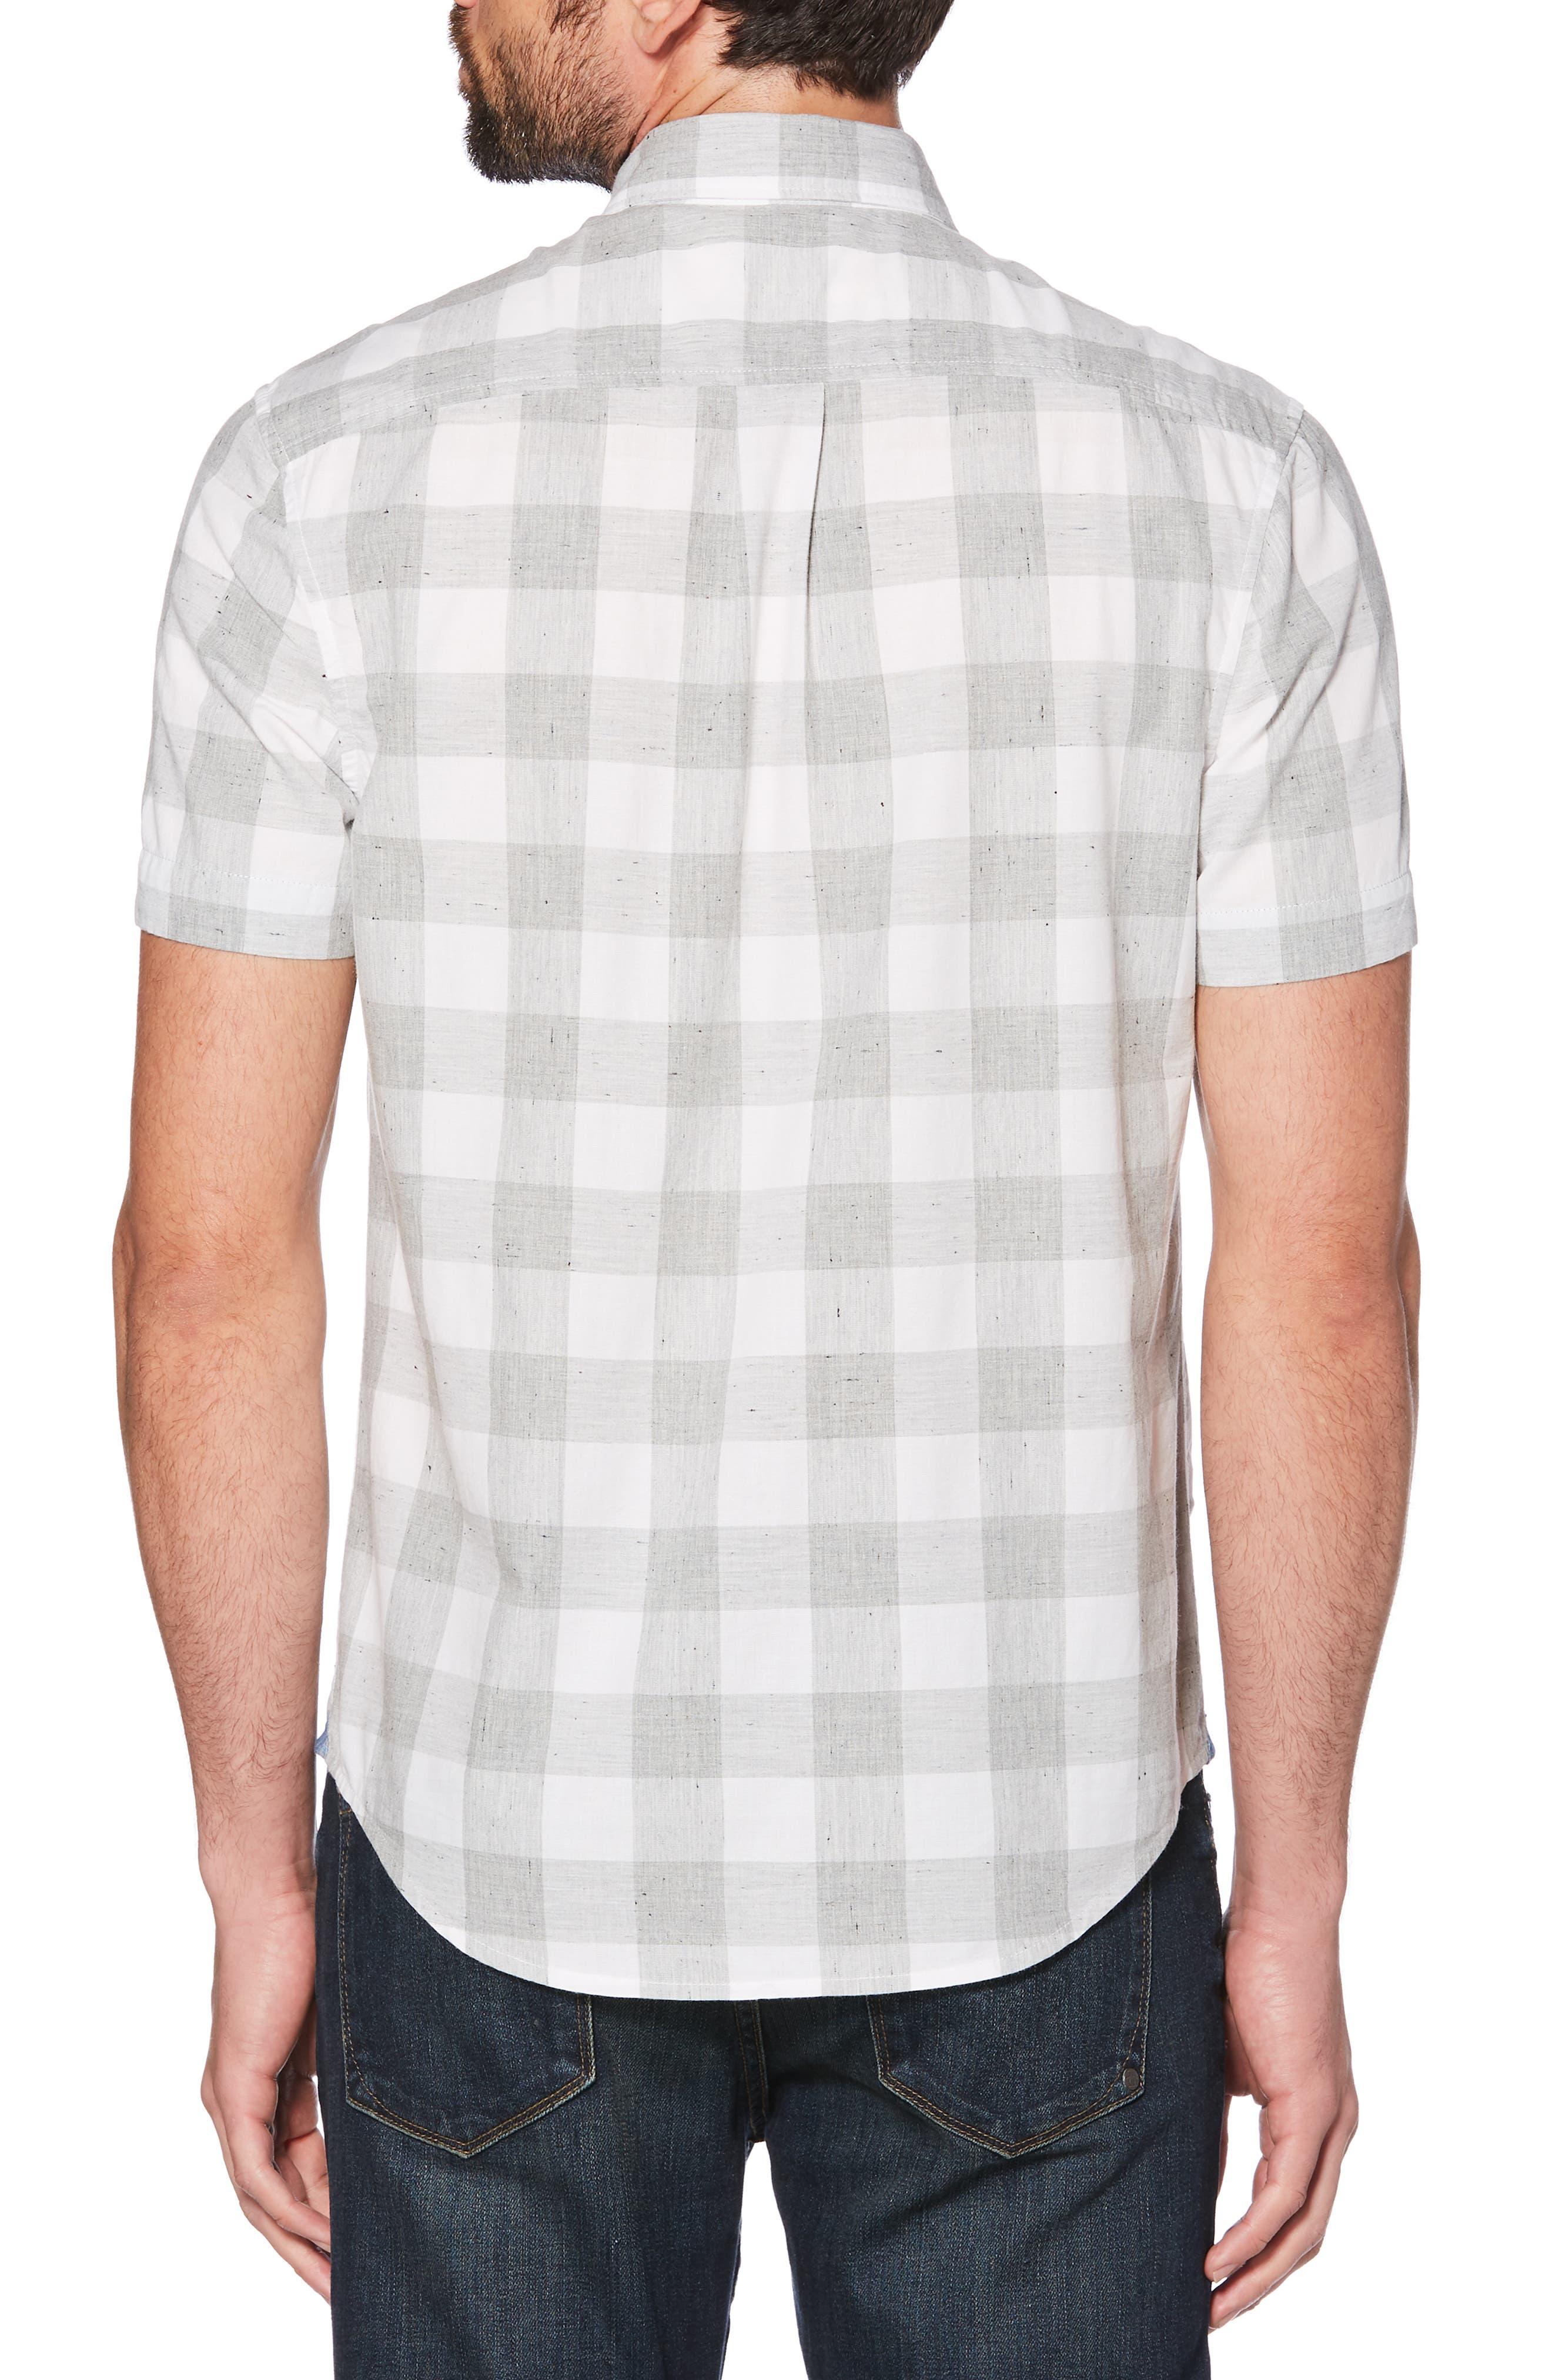 ORIGINAL PENGUIN, Heather Buffalo Plaid Woven Shirt, Alternate thumbnail 2, color, 037